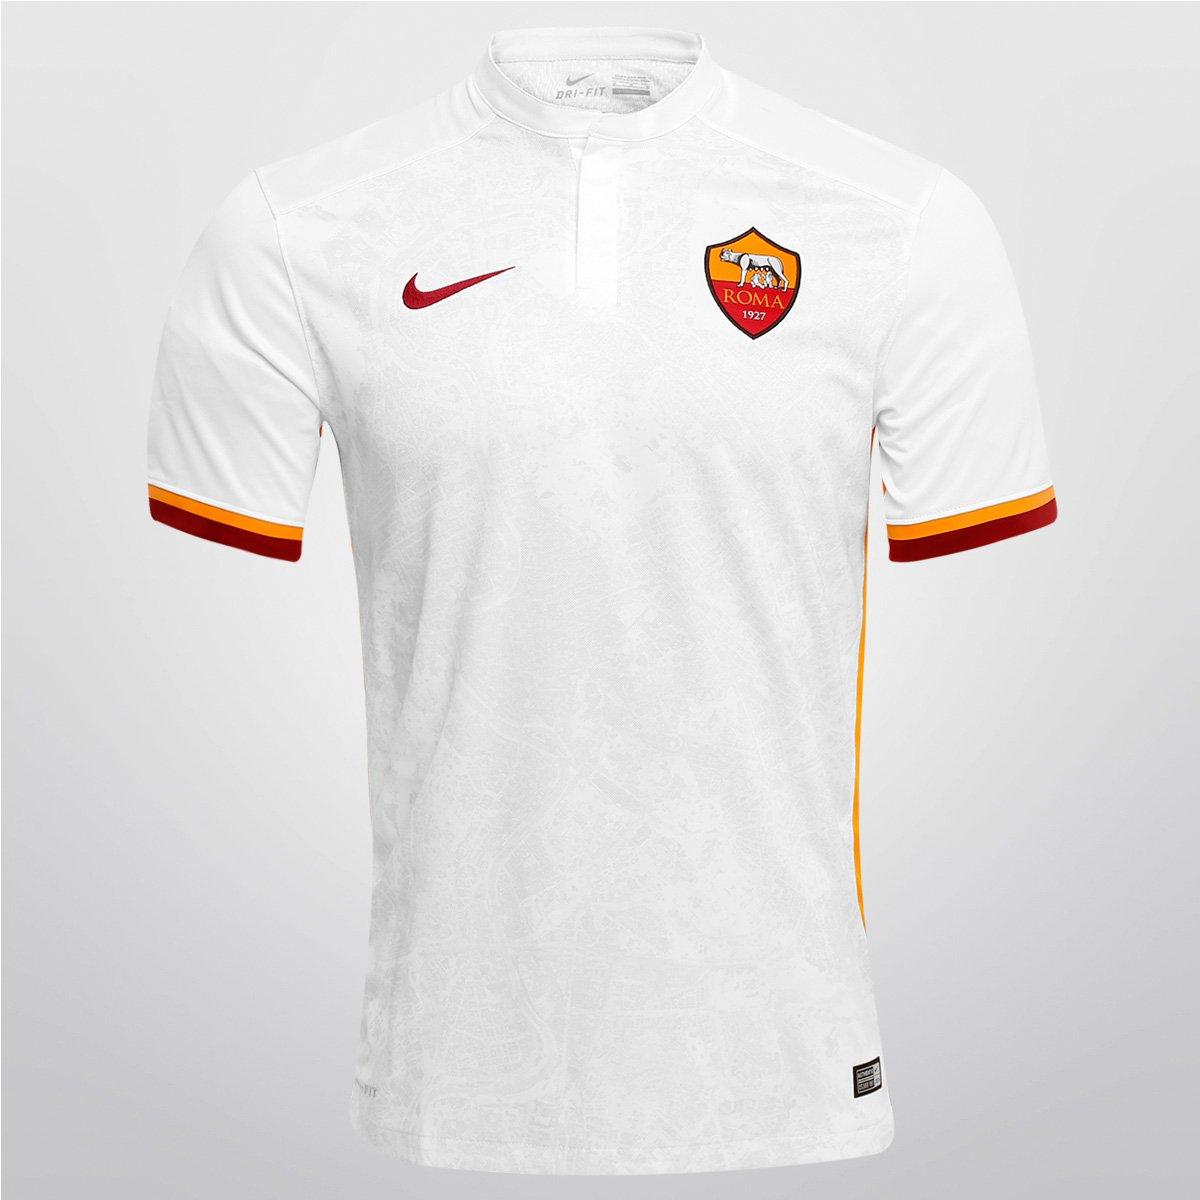 Camisa Nike Roma Away 15 16 s nº - Compre Agora  8c3b0dcf302ec